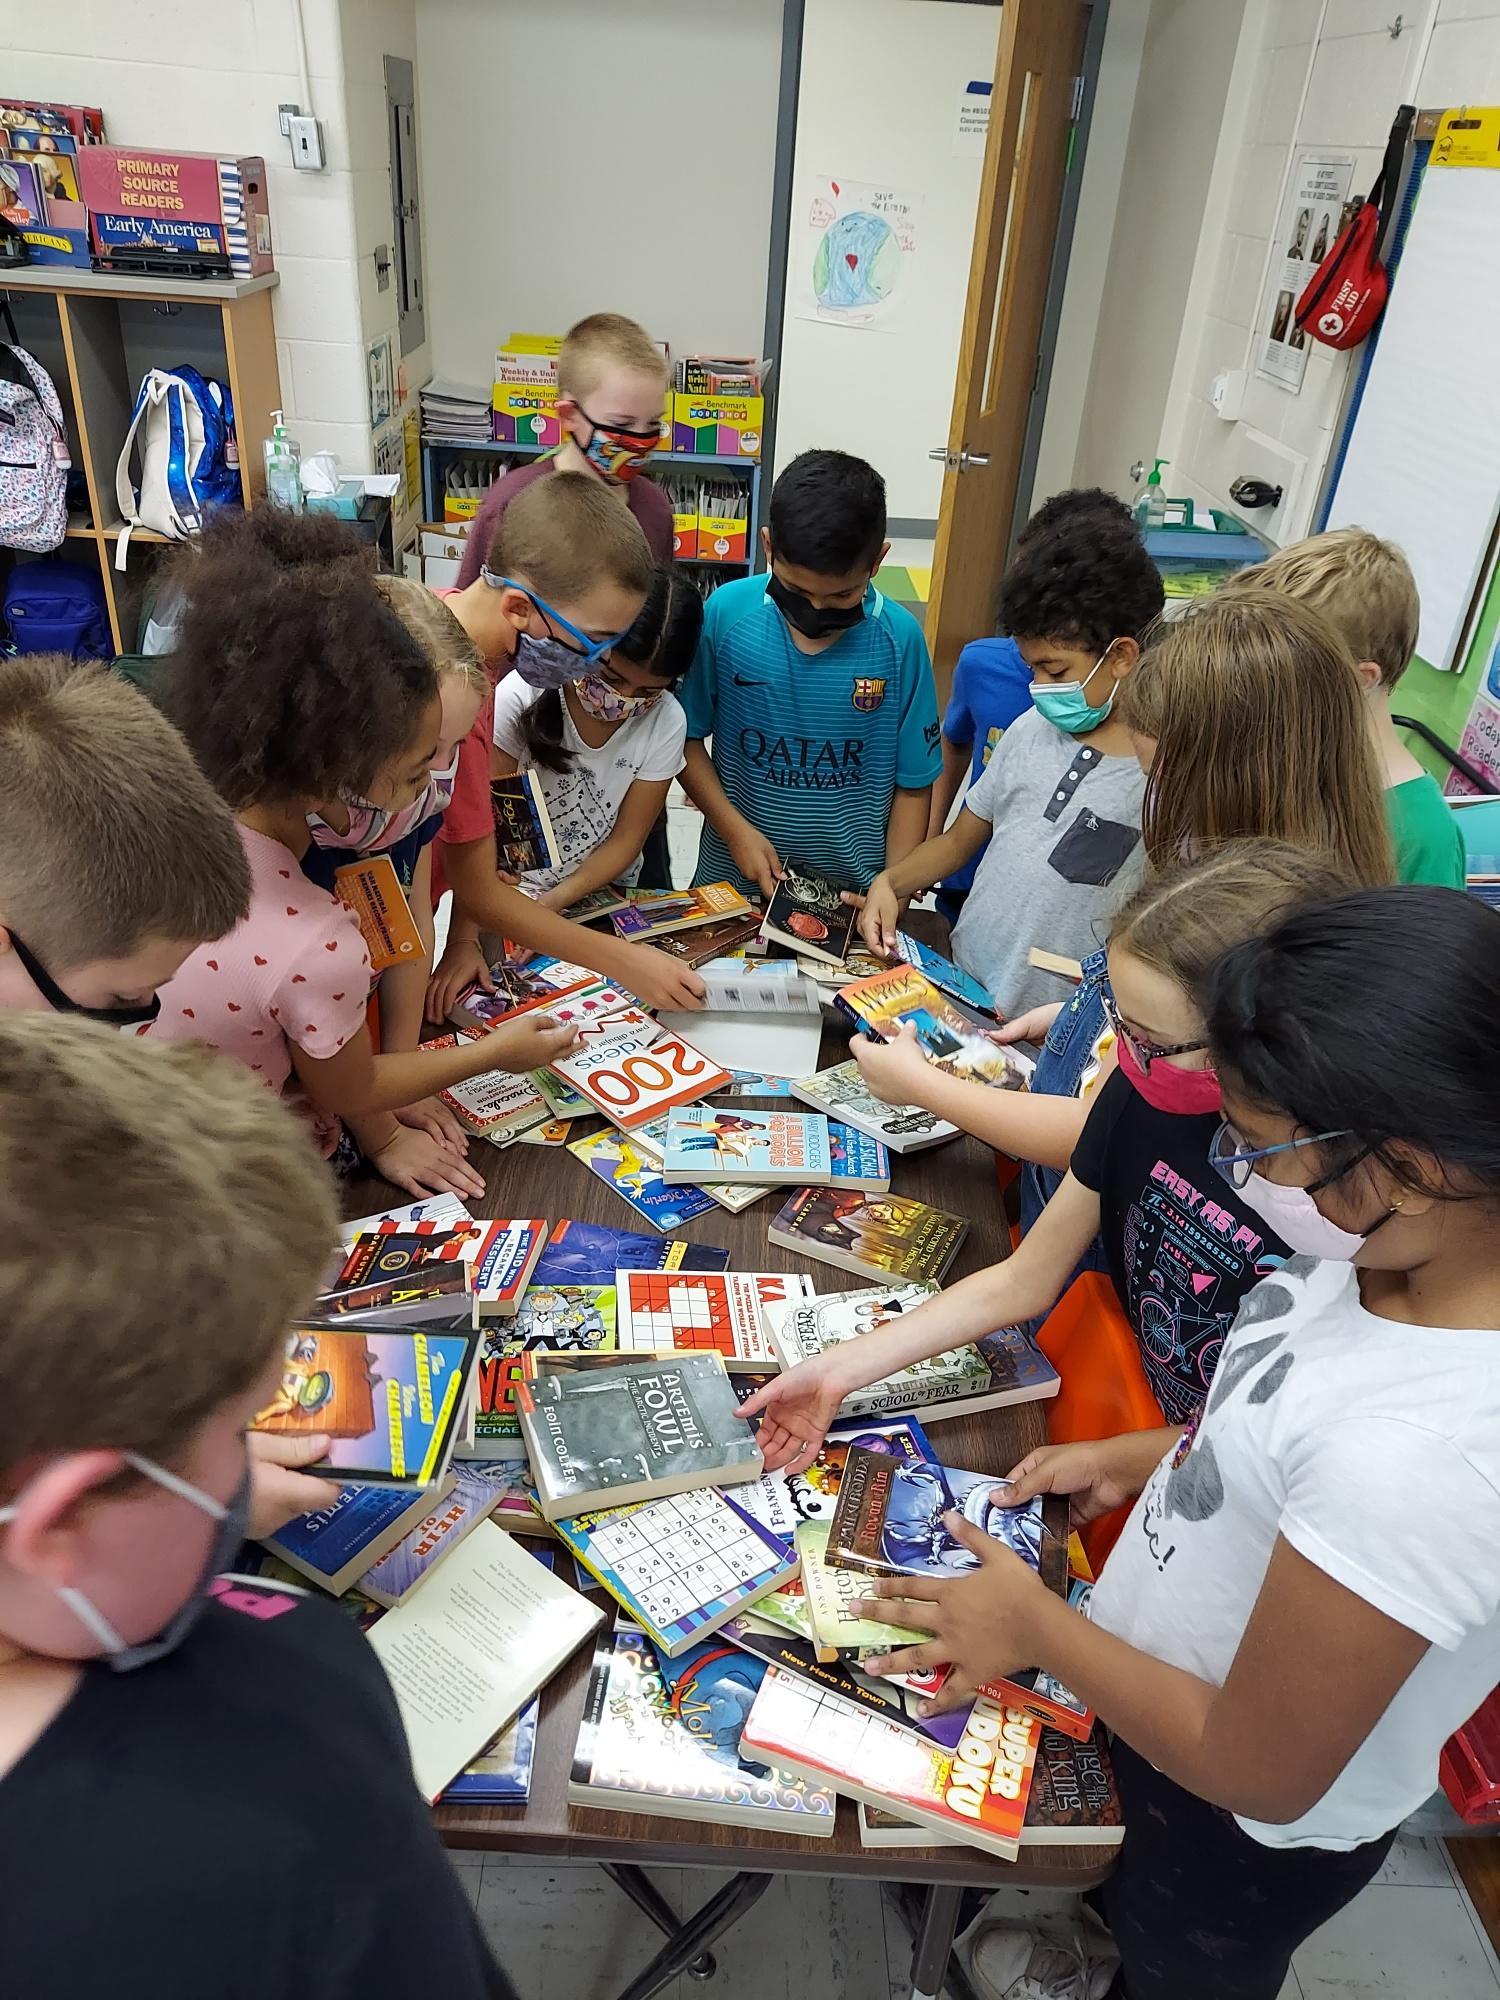 Christiansburg Elementary School